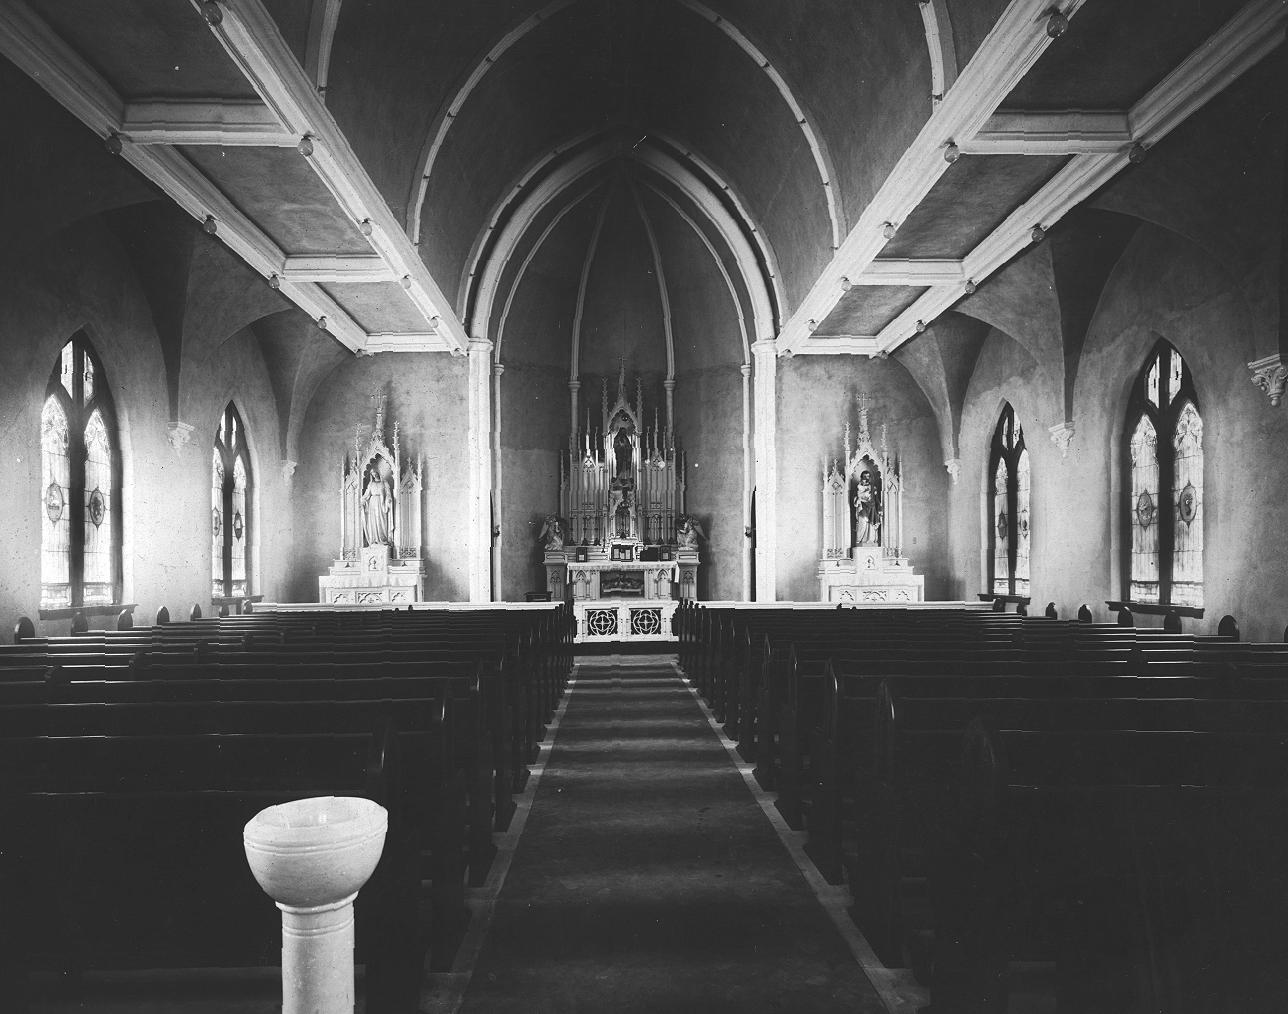 Church Interior at Dedication, 1921